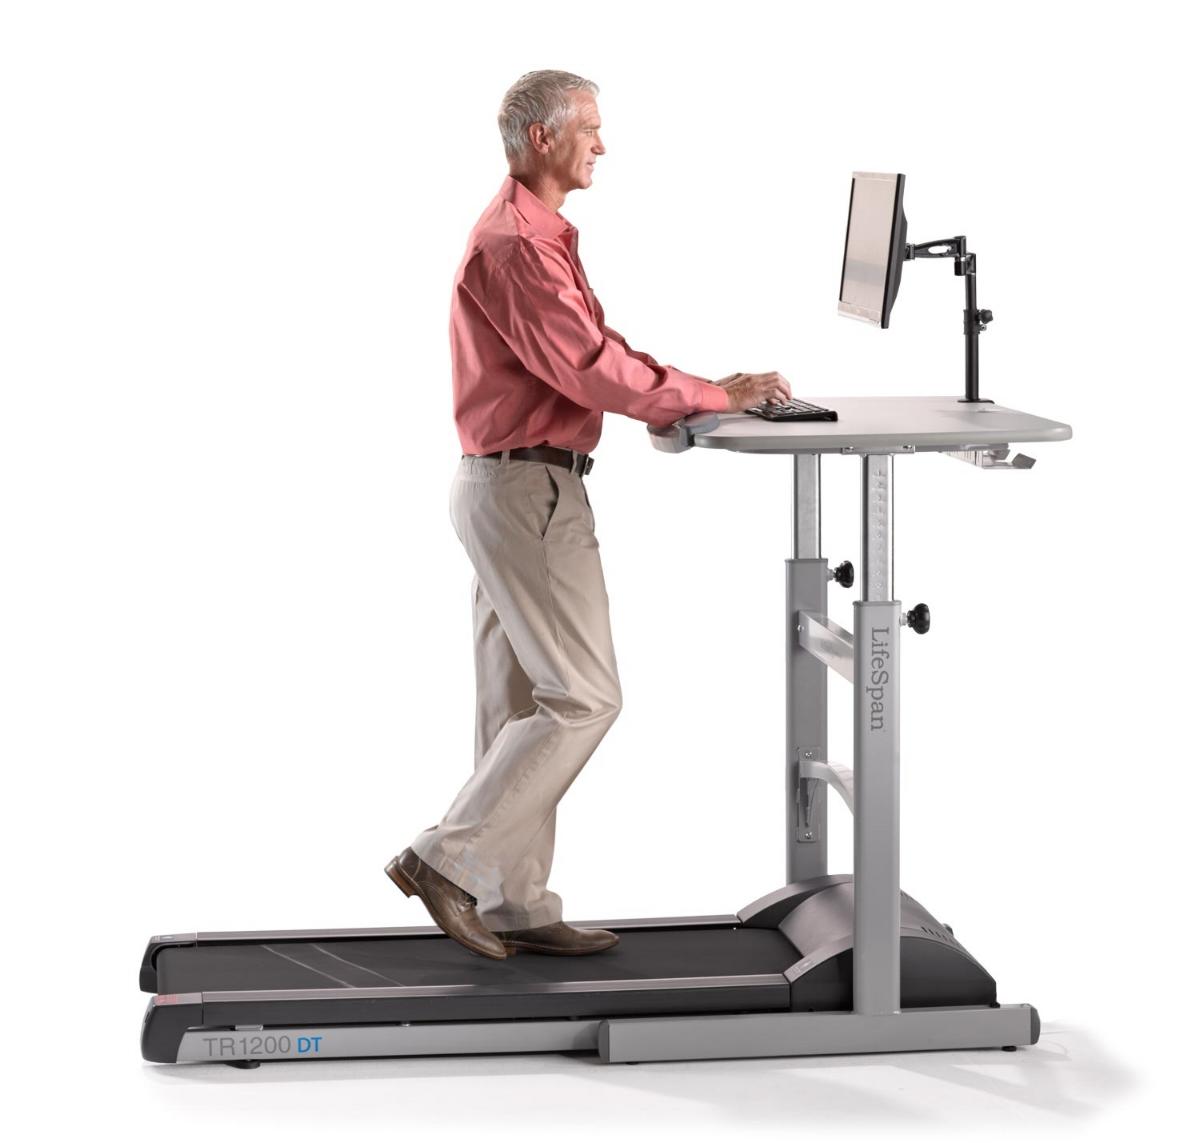 LifeSpan-Treadmill-Desk_Male_72dpi.jpg